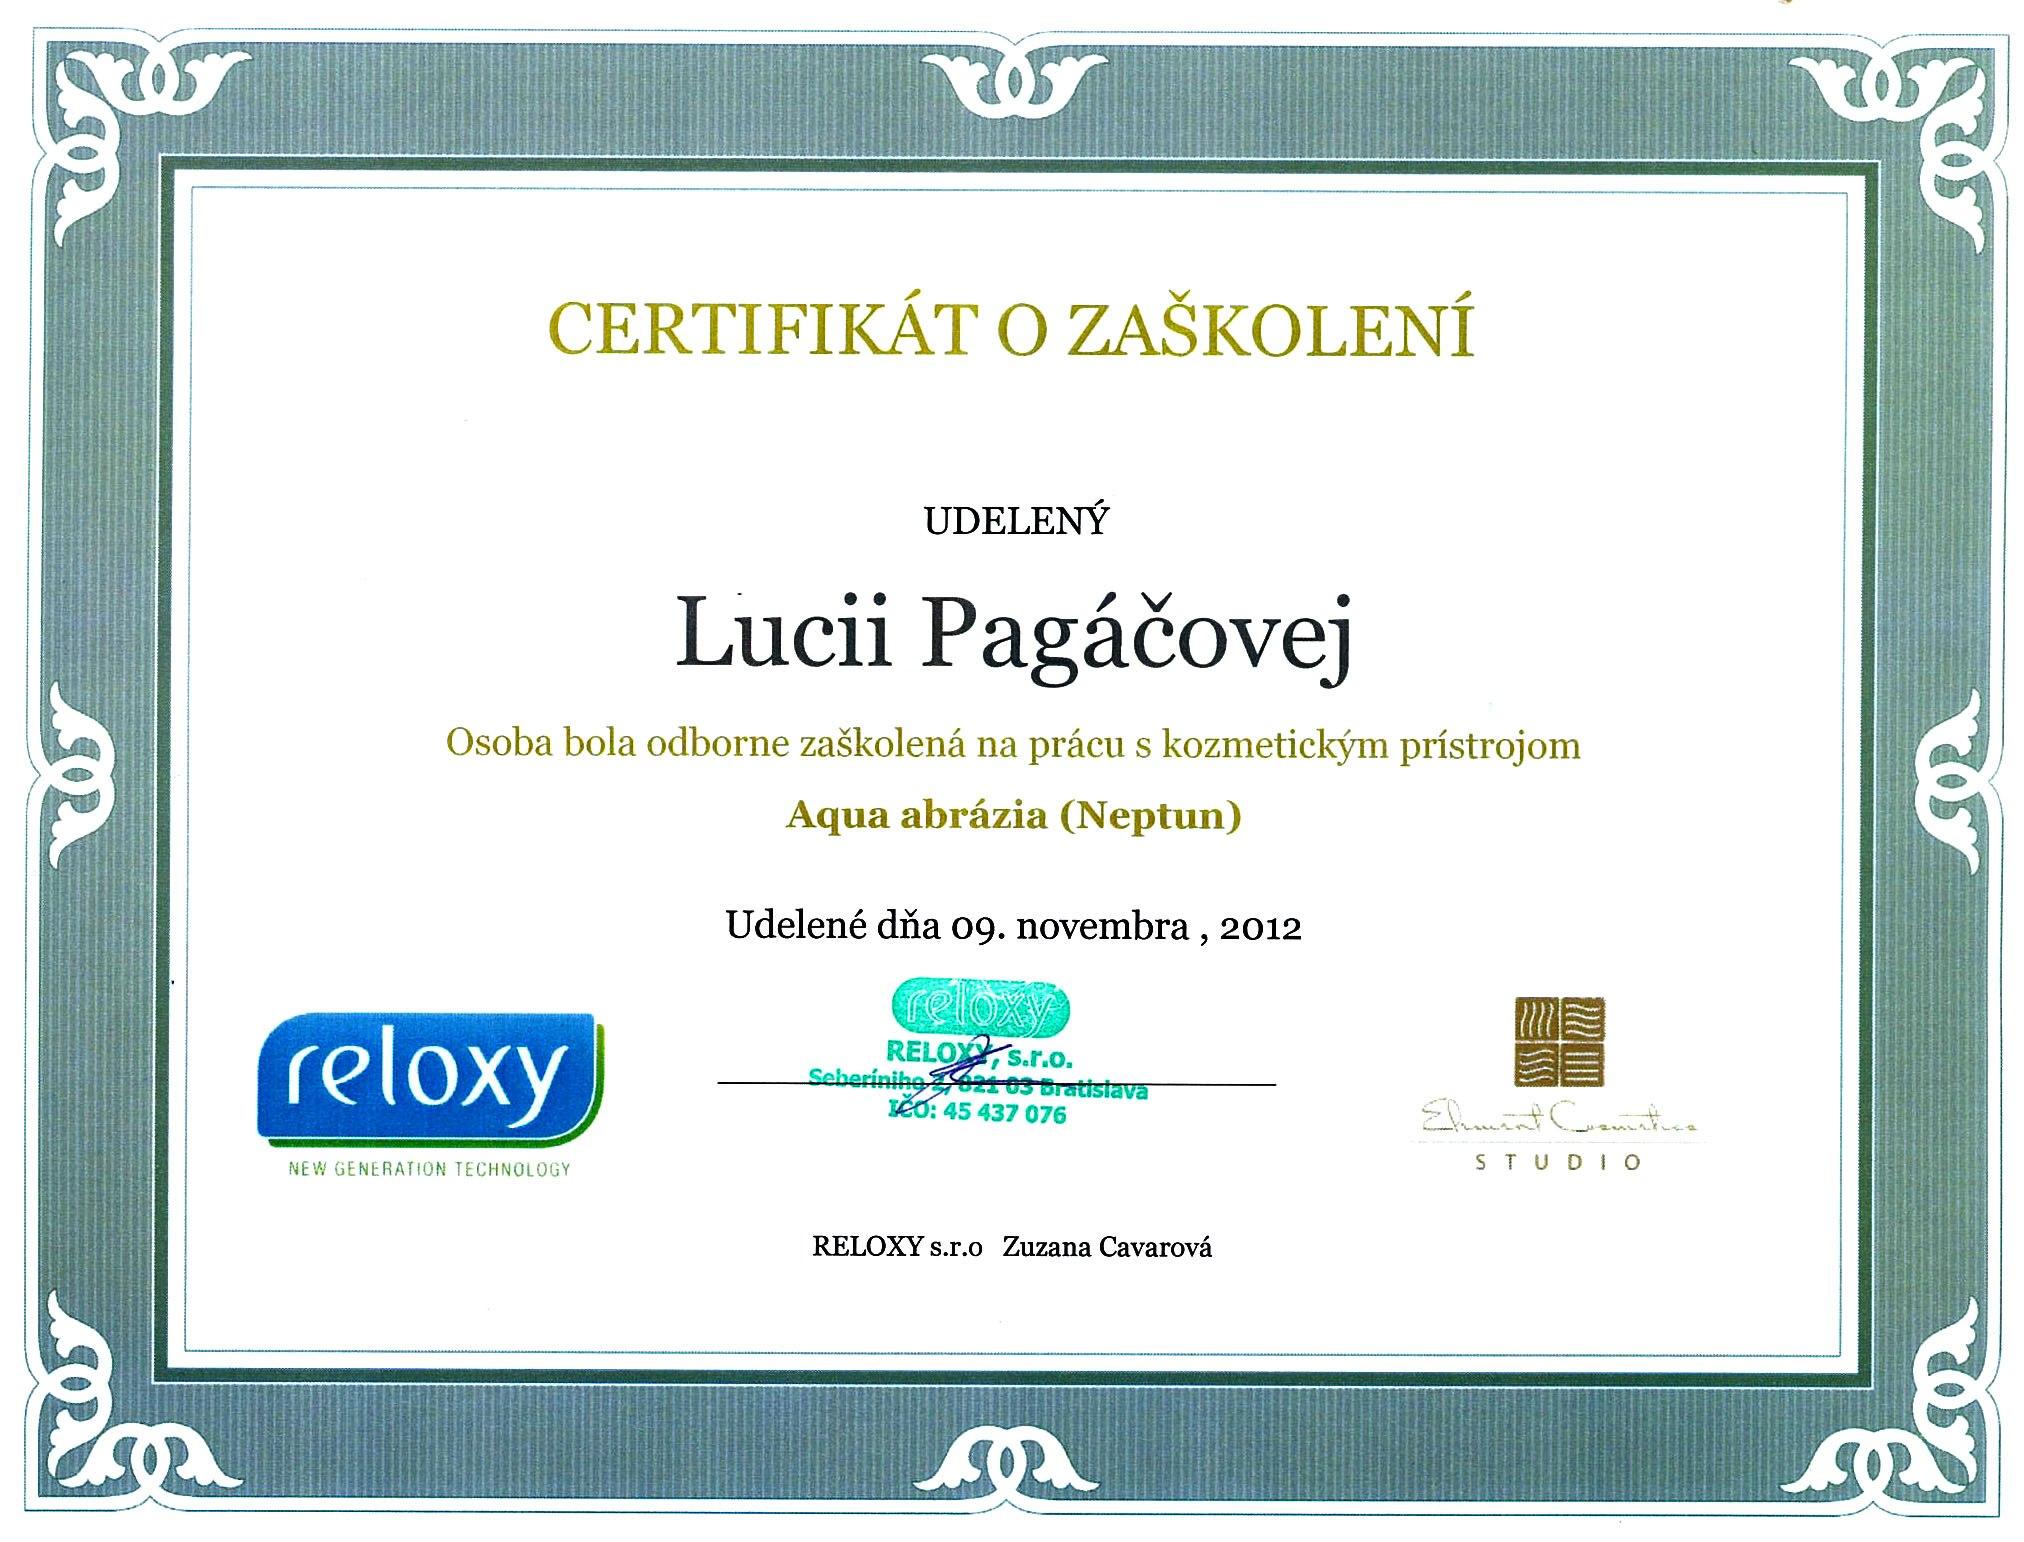 certifikat-salon-krasy-bratislava